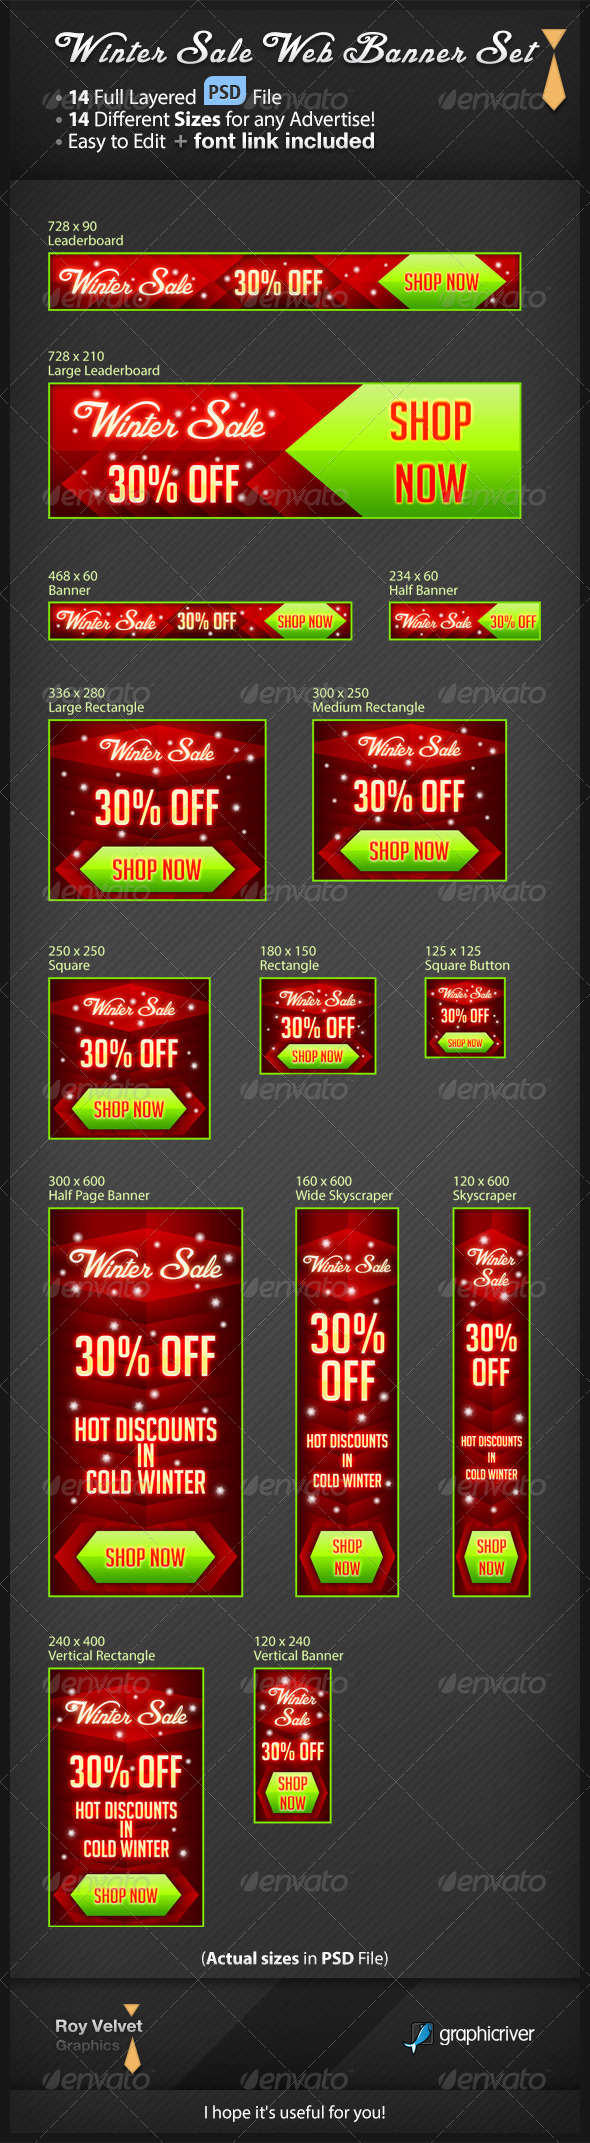 Winter Sale Web Banner Set - Banners & Ads Web Elements